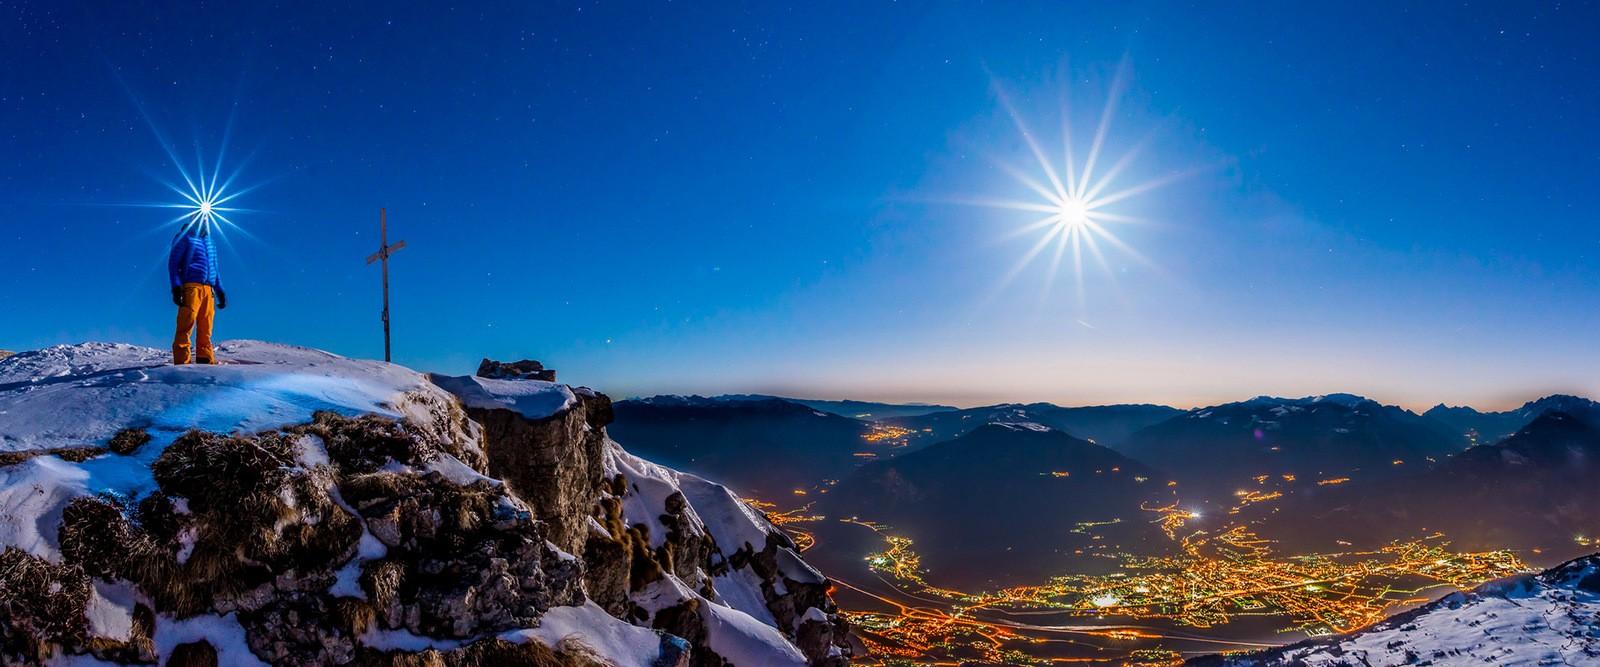 Monte Stivo - Vallagarina - Trentino